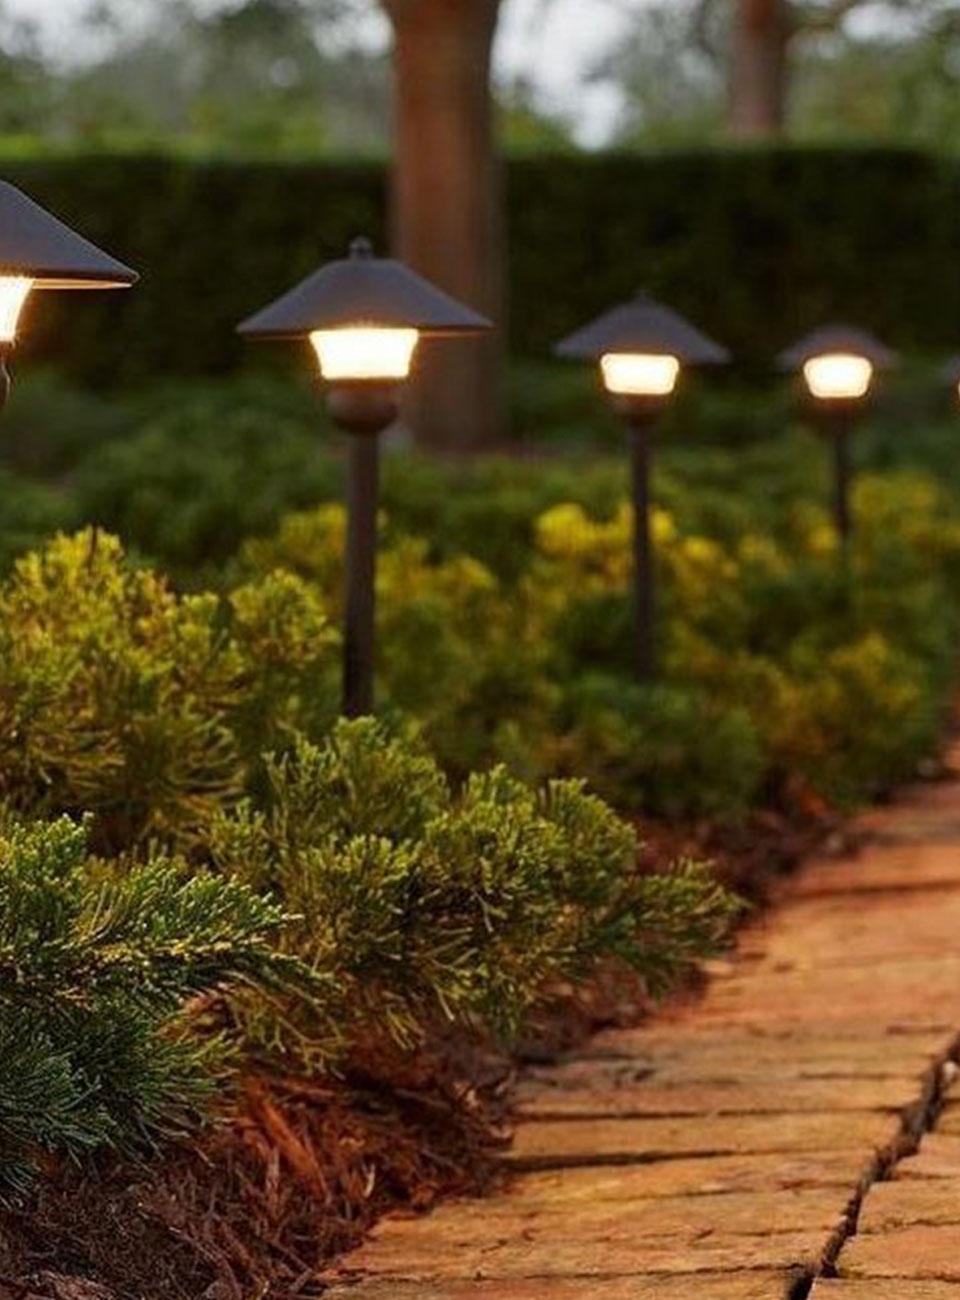 electricians for outdoor lighting in urmston